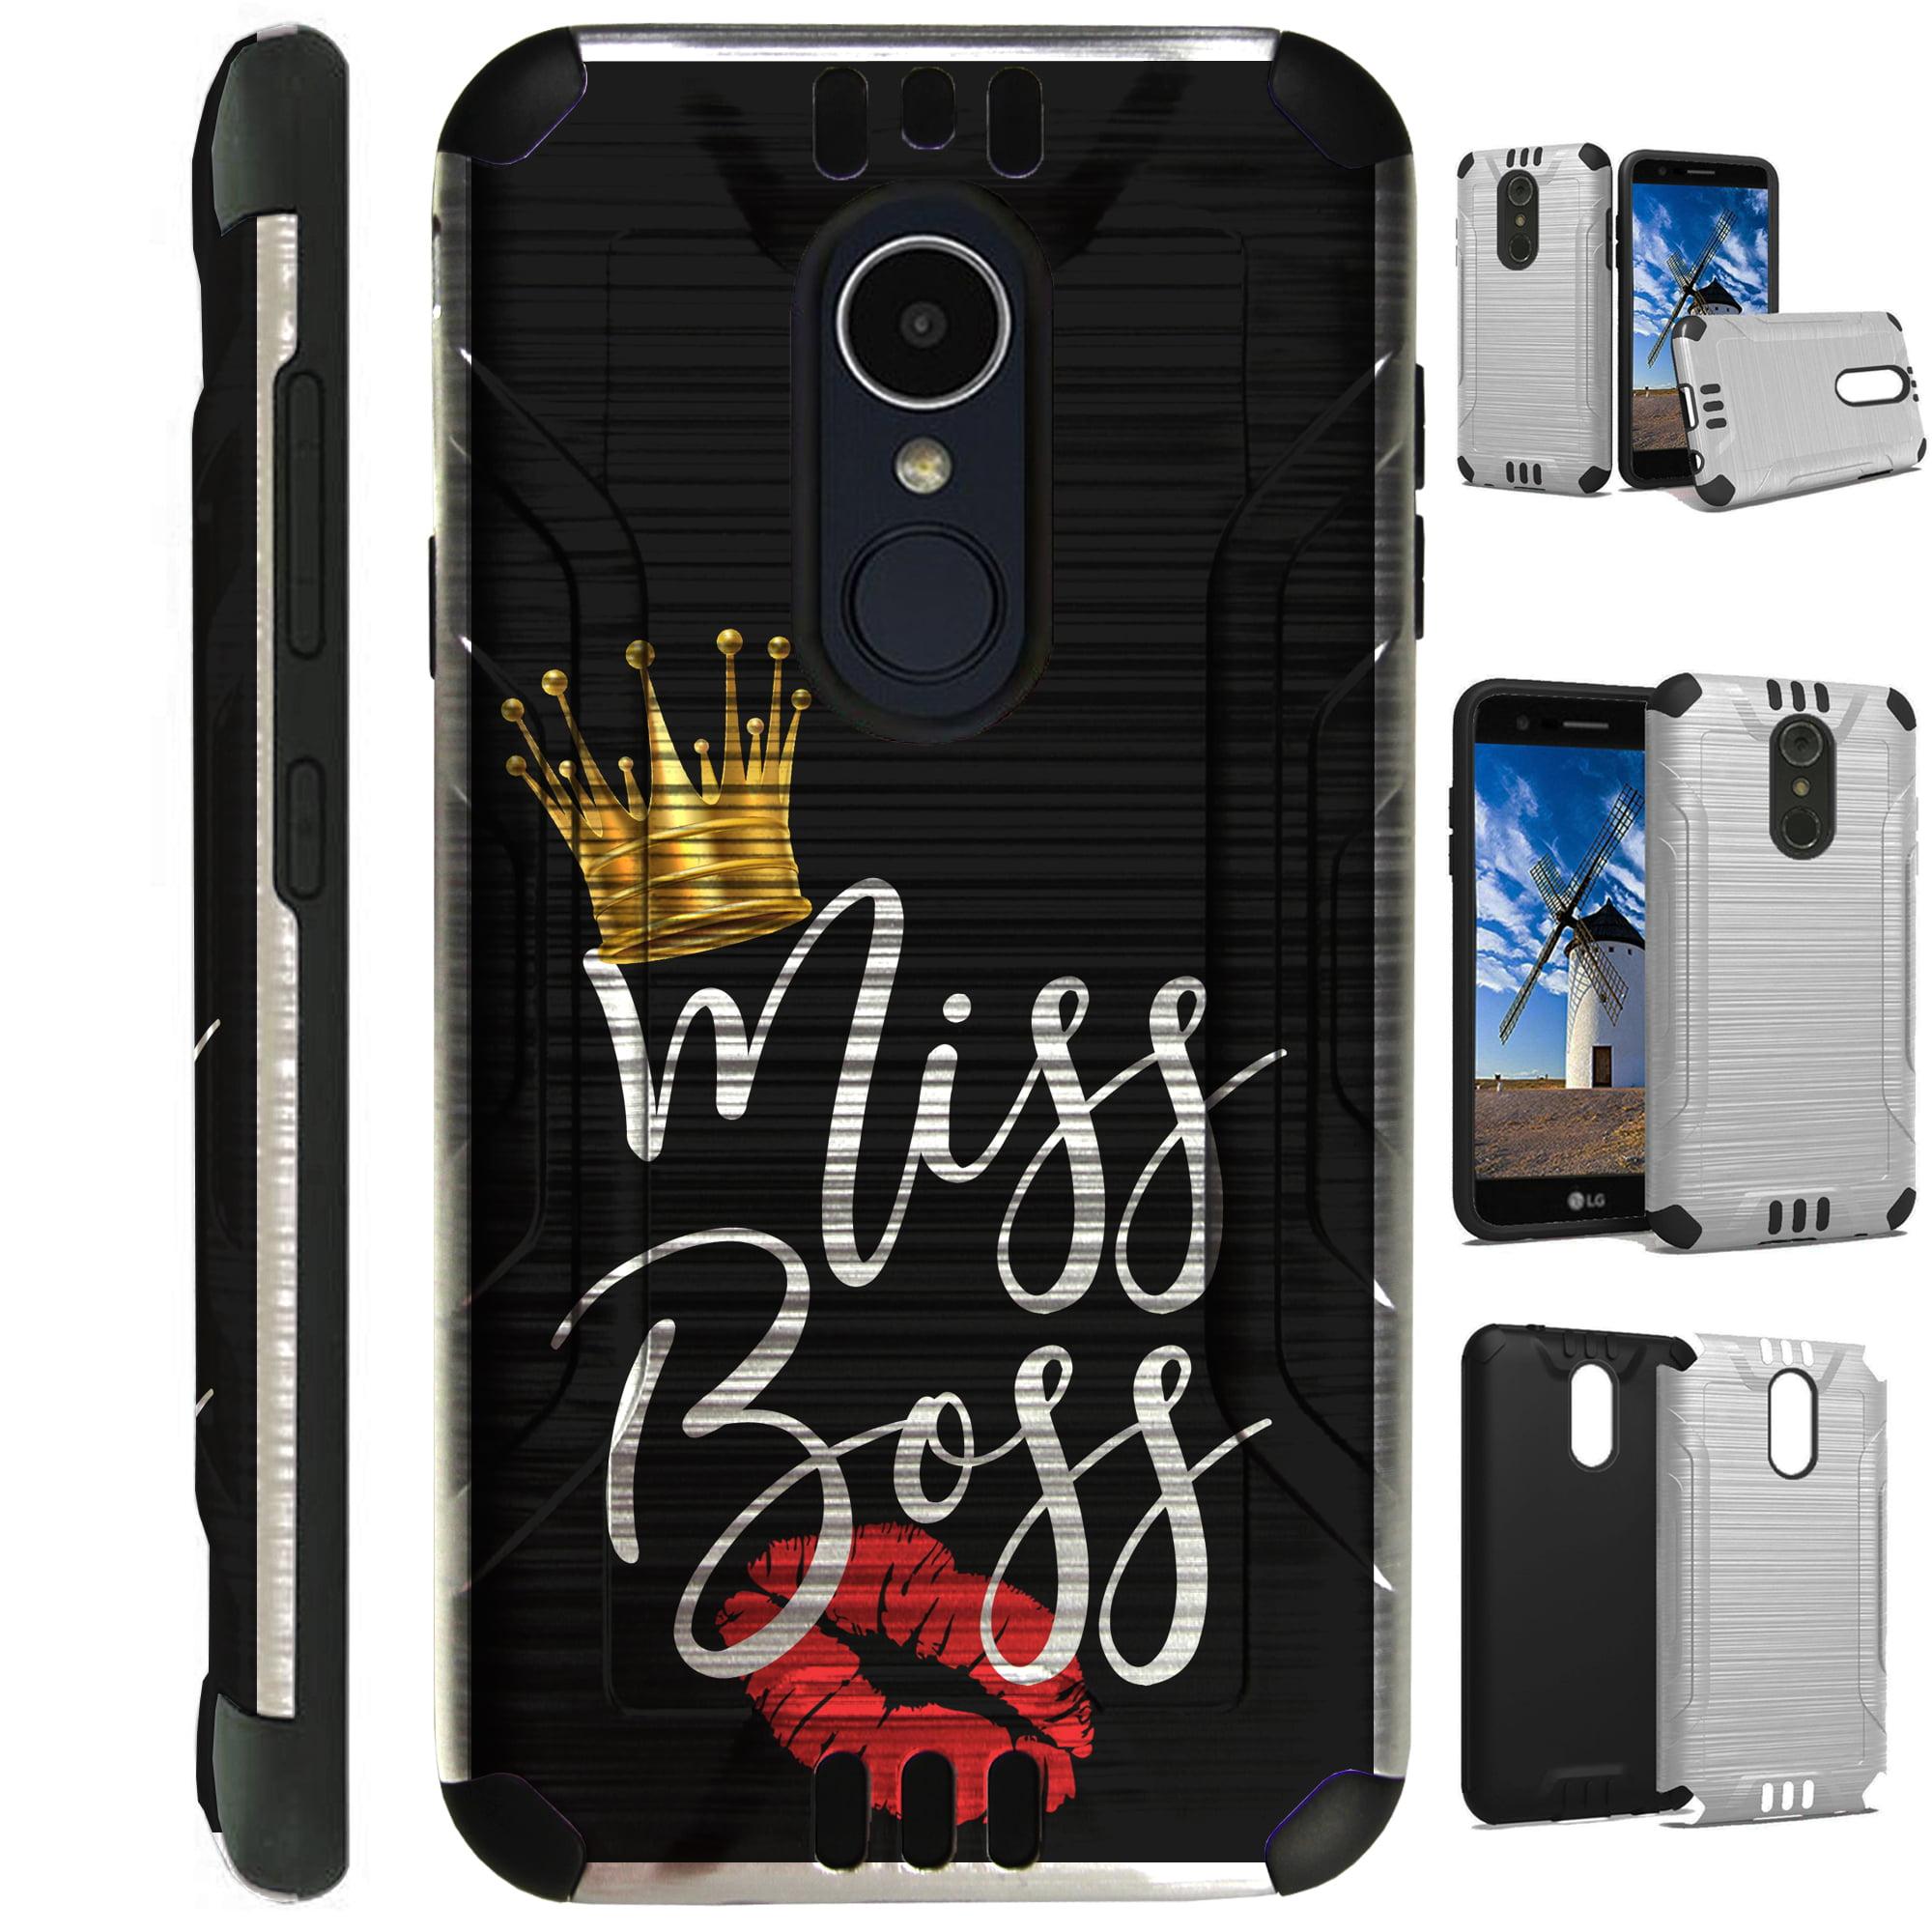 For LG Rebel 3 | LG Rebel 4 Case Brushed Metal Texture Hybrid TPU Silver Guard Phone Cover (Miss Boss)